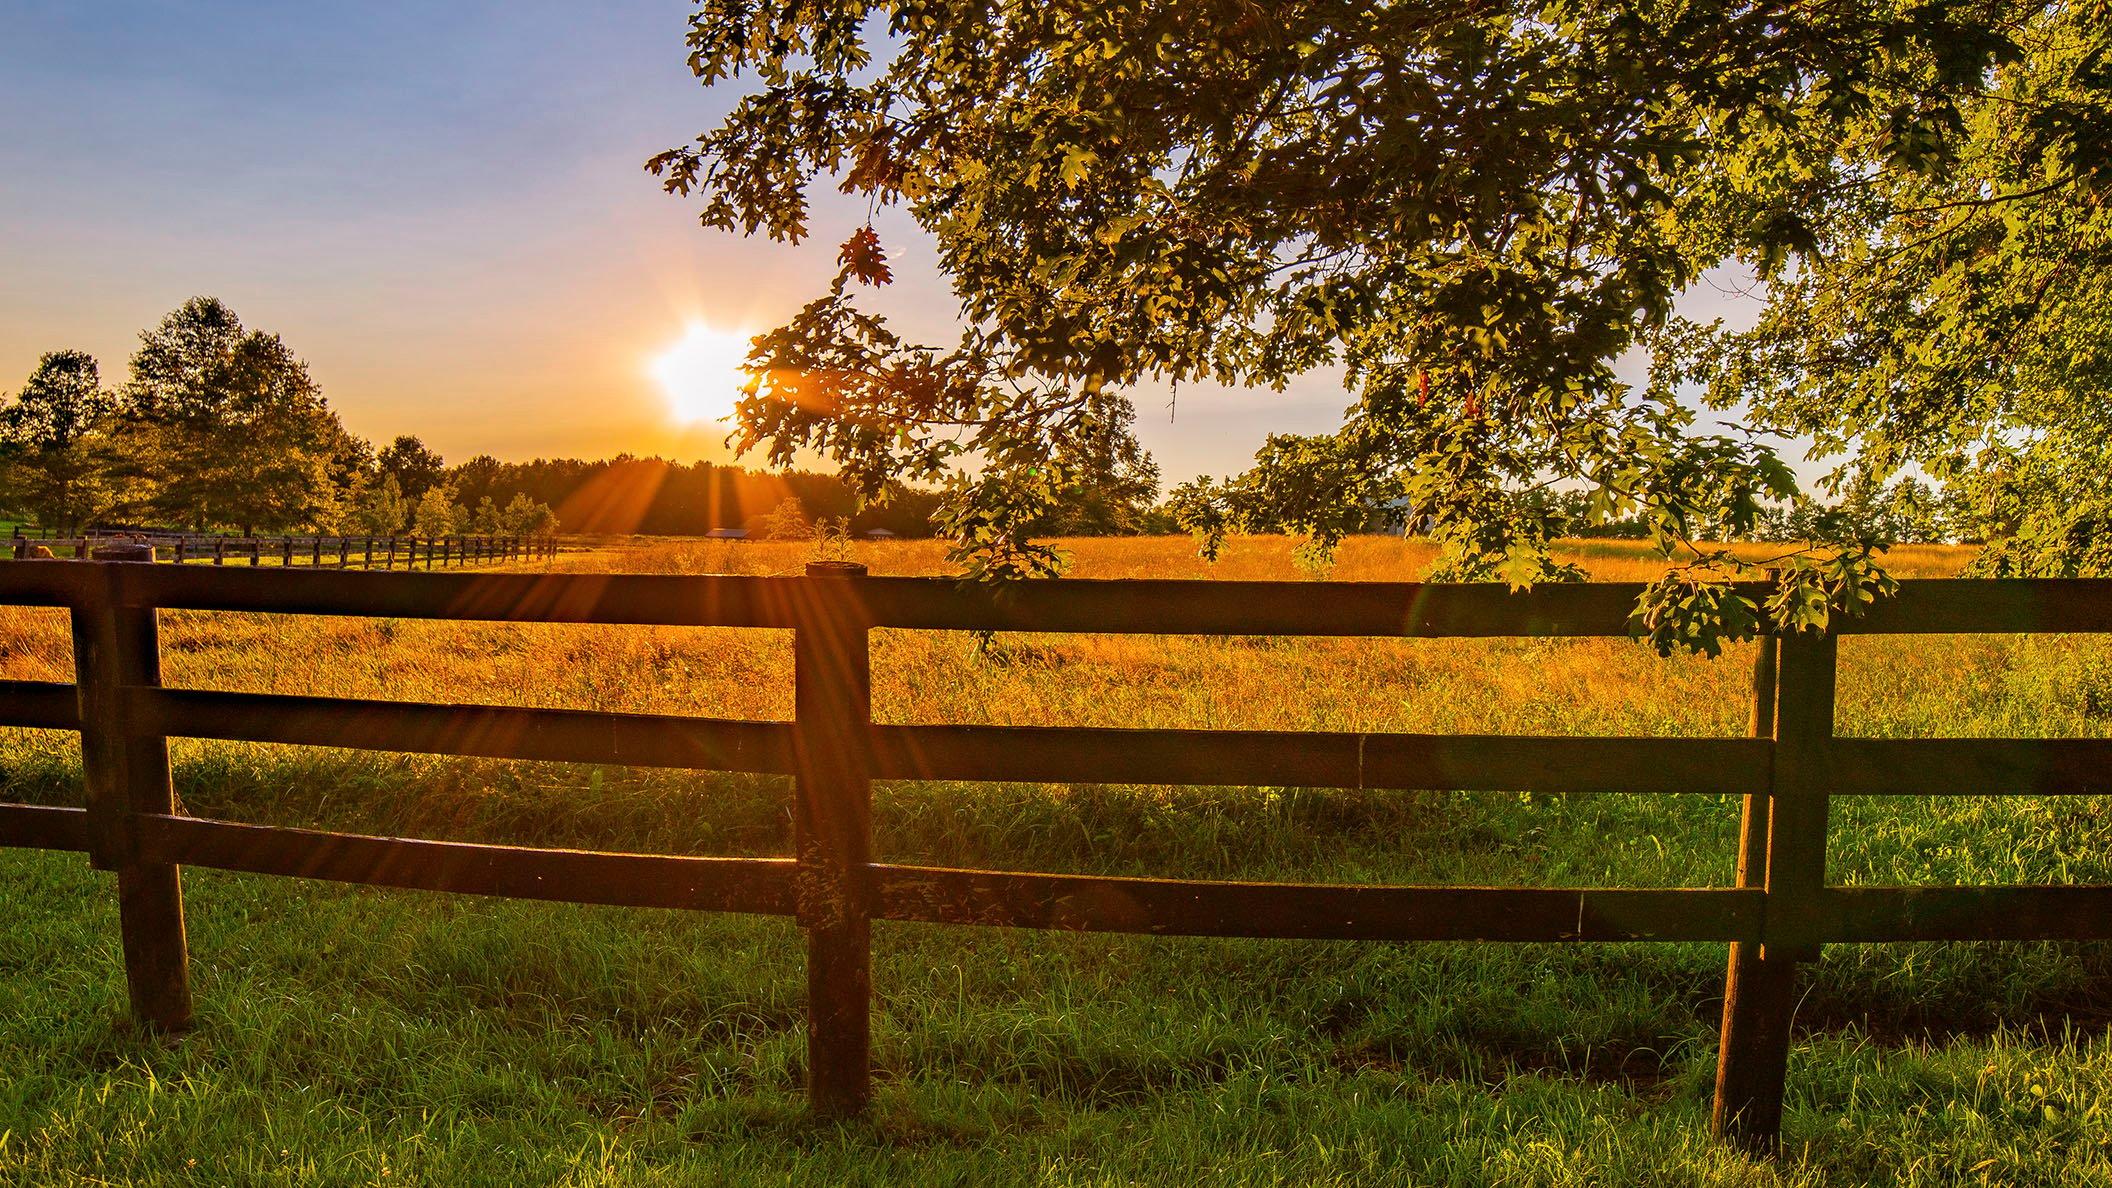 Rural sunset, Union County, Ohio